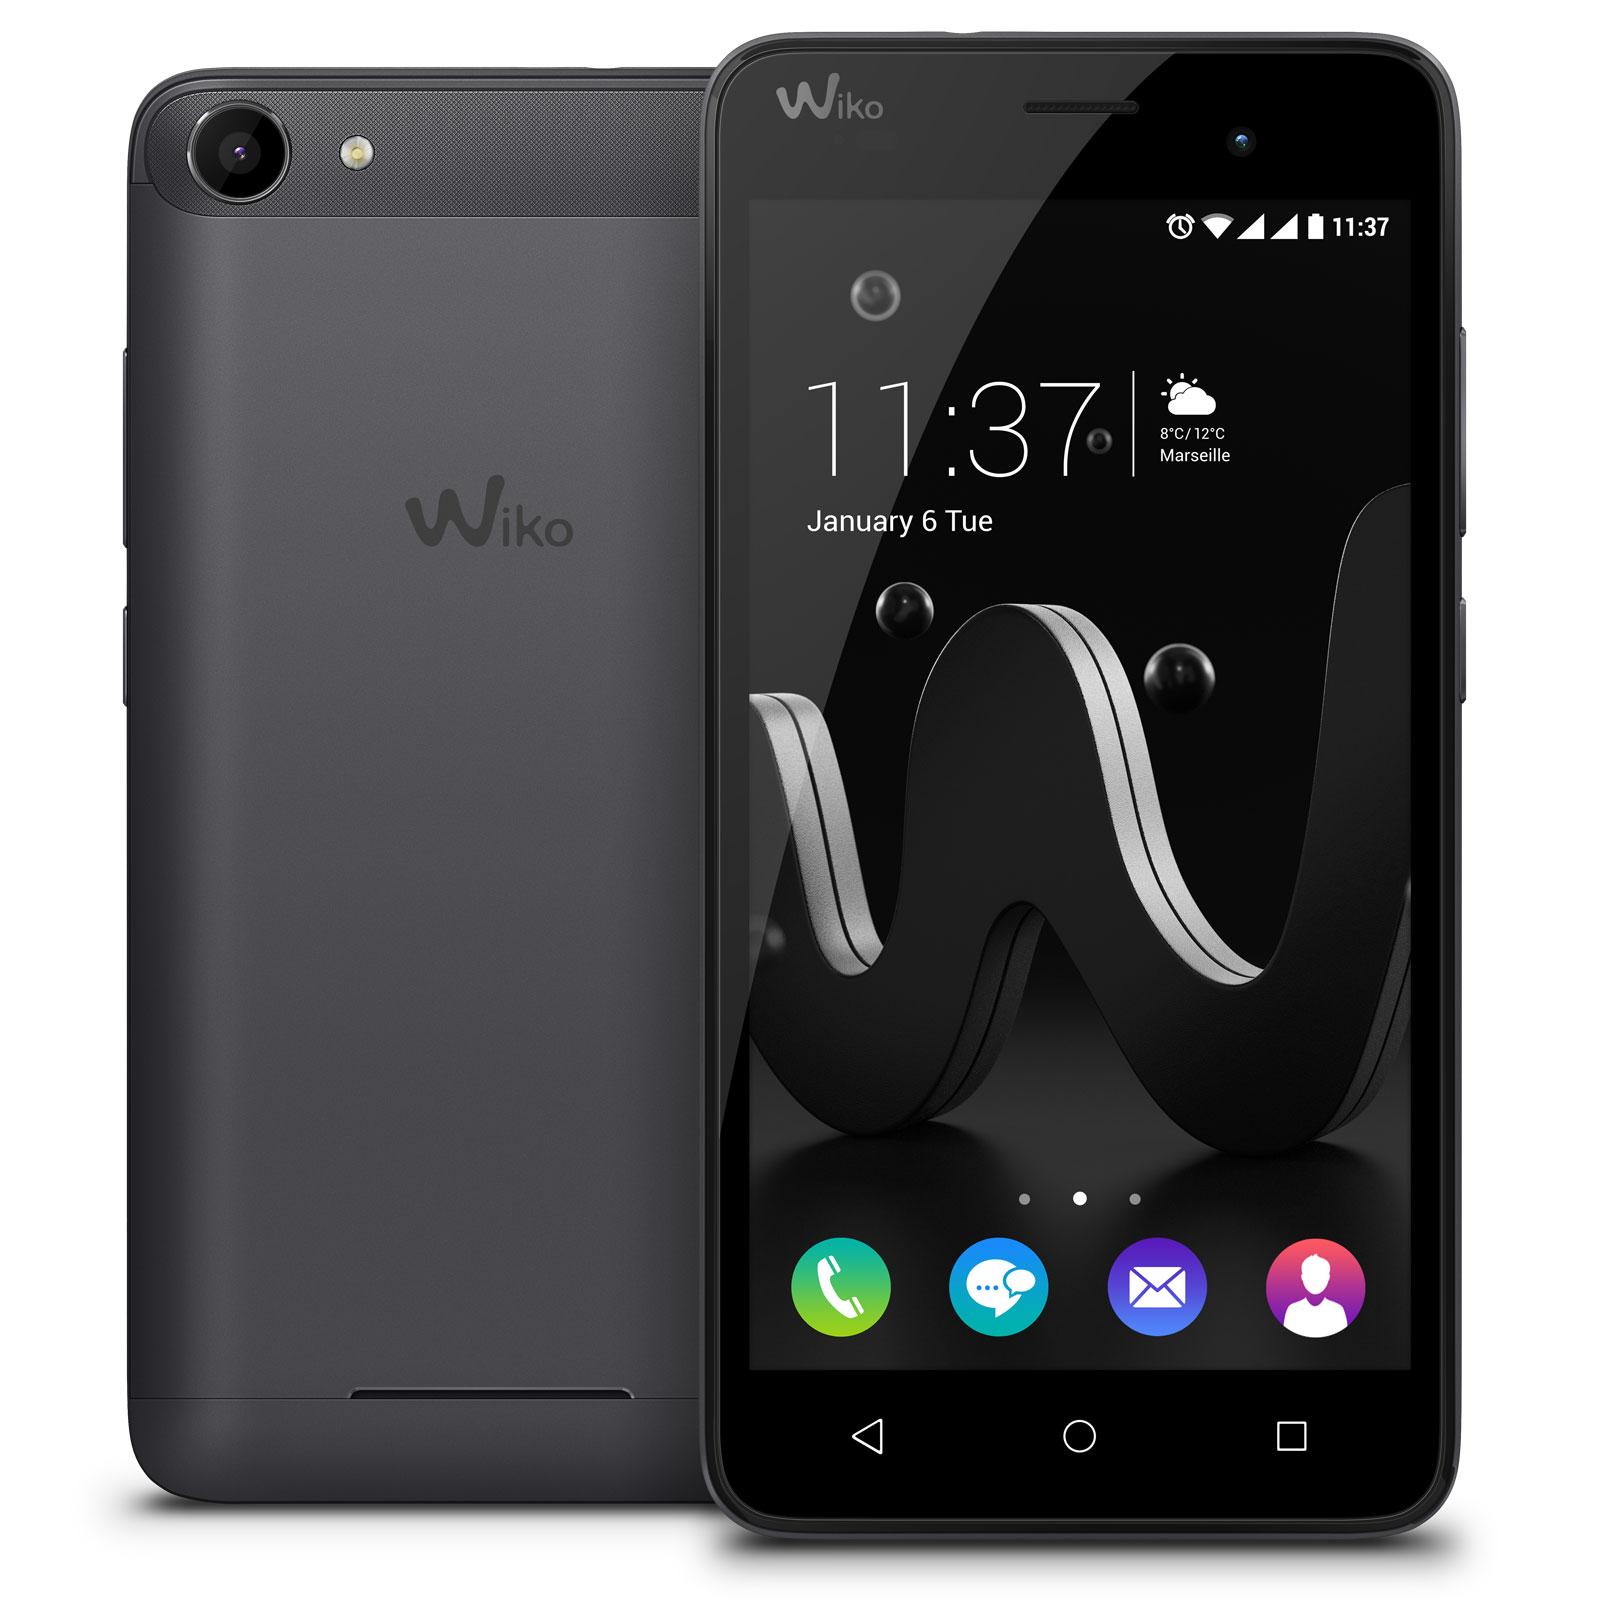 Wiko jerry noir mobile smartphone wiko sur ldlc for Photo ecran wiko